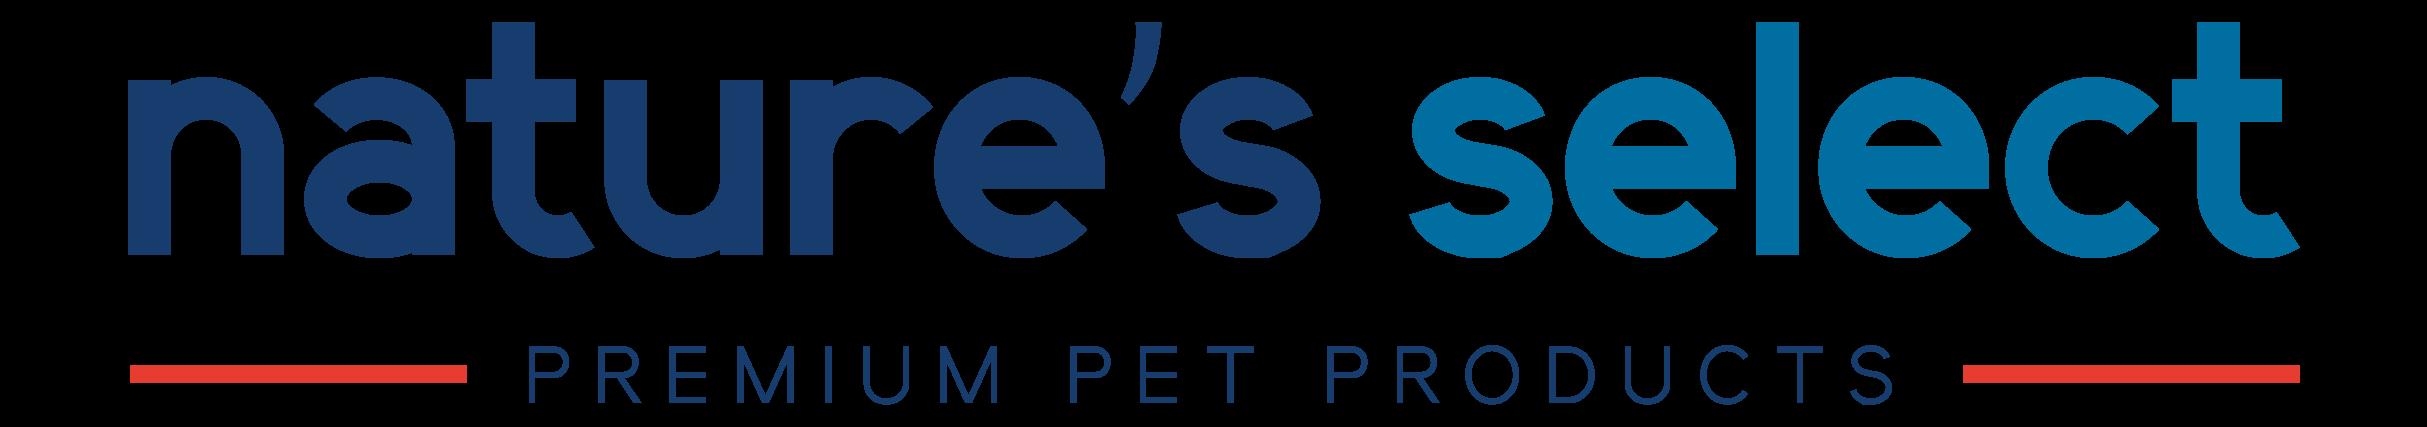 Nature's Select Logo